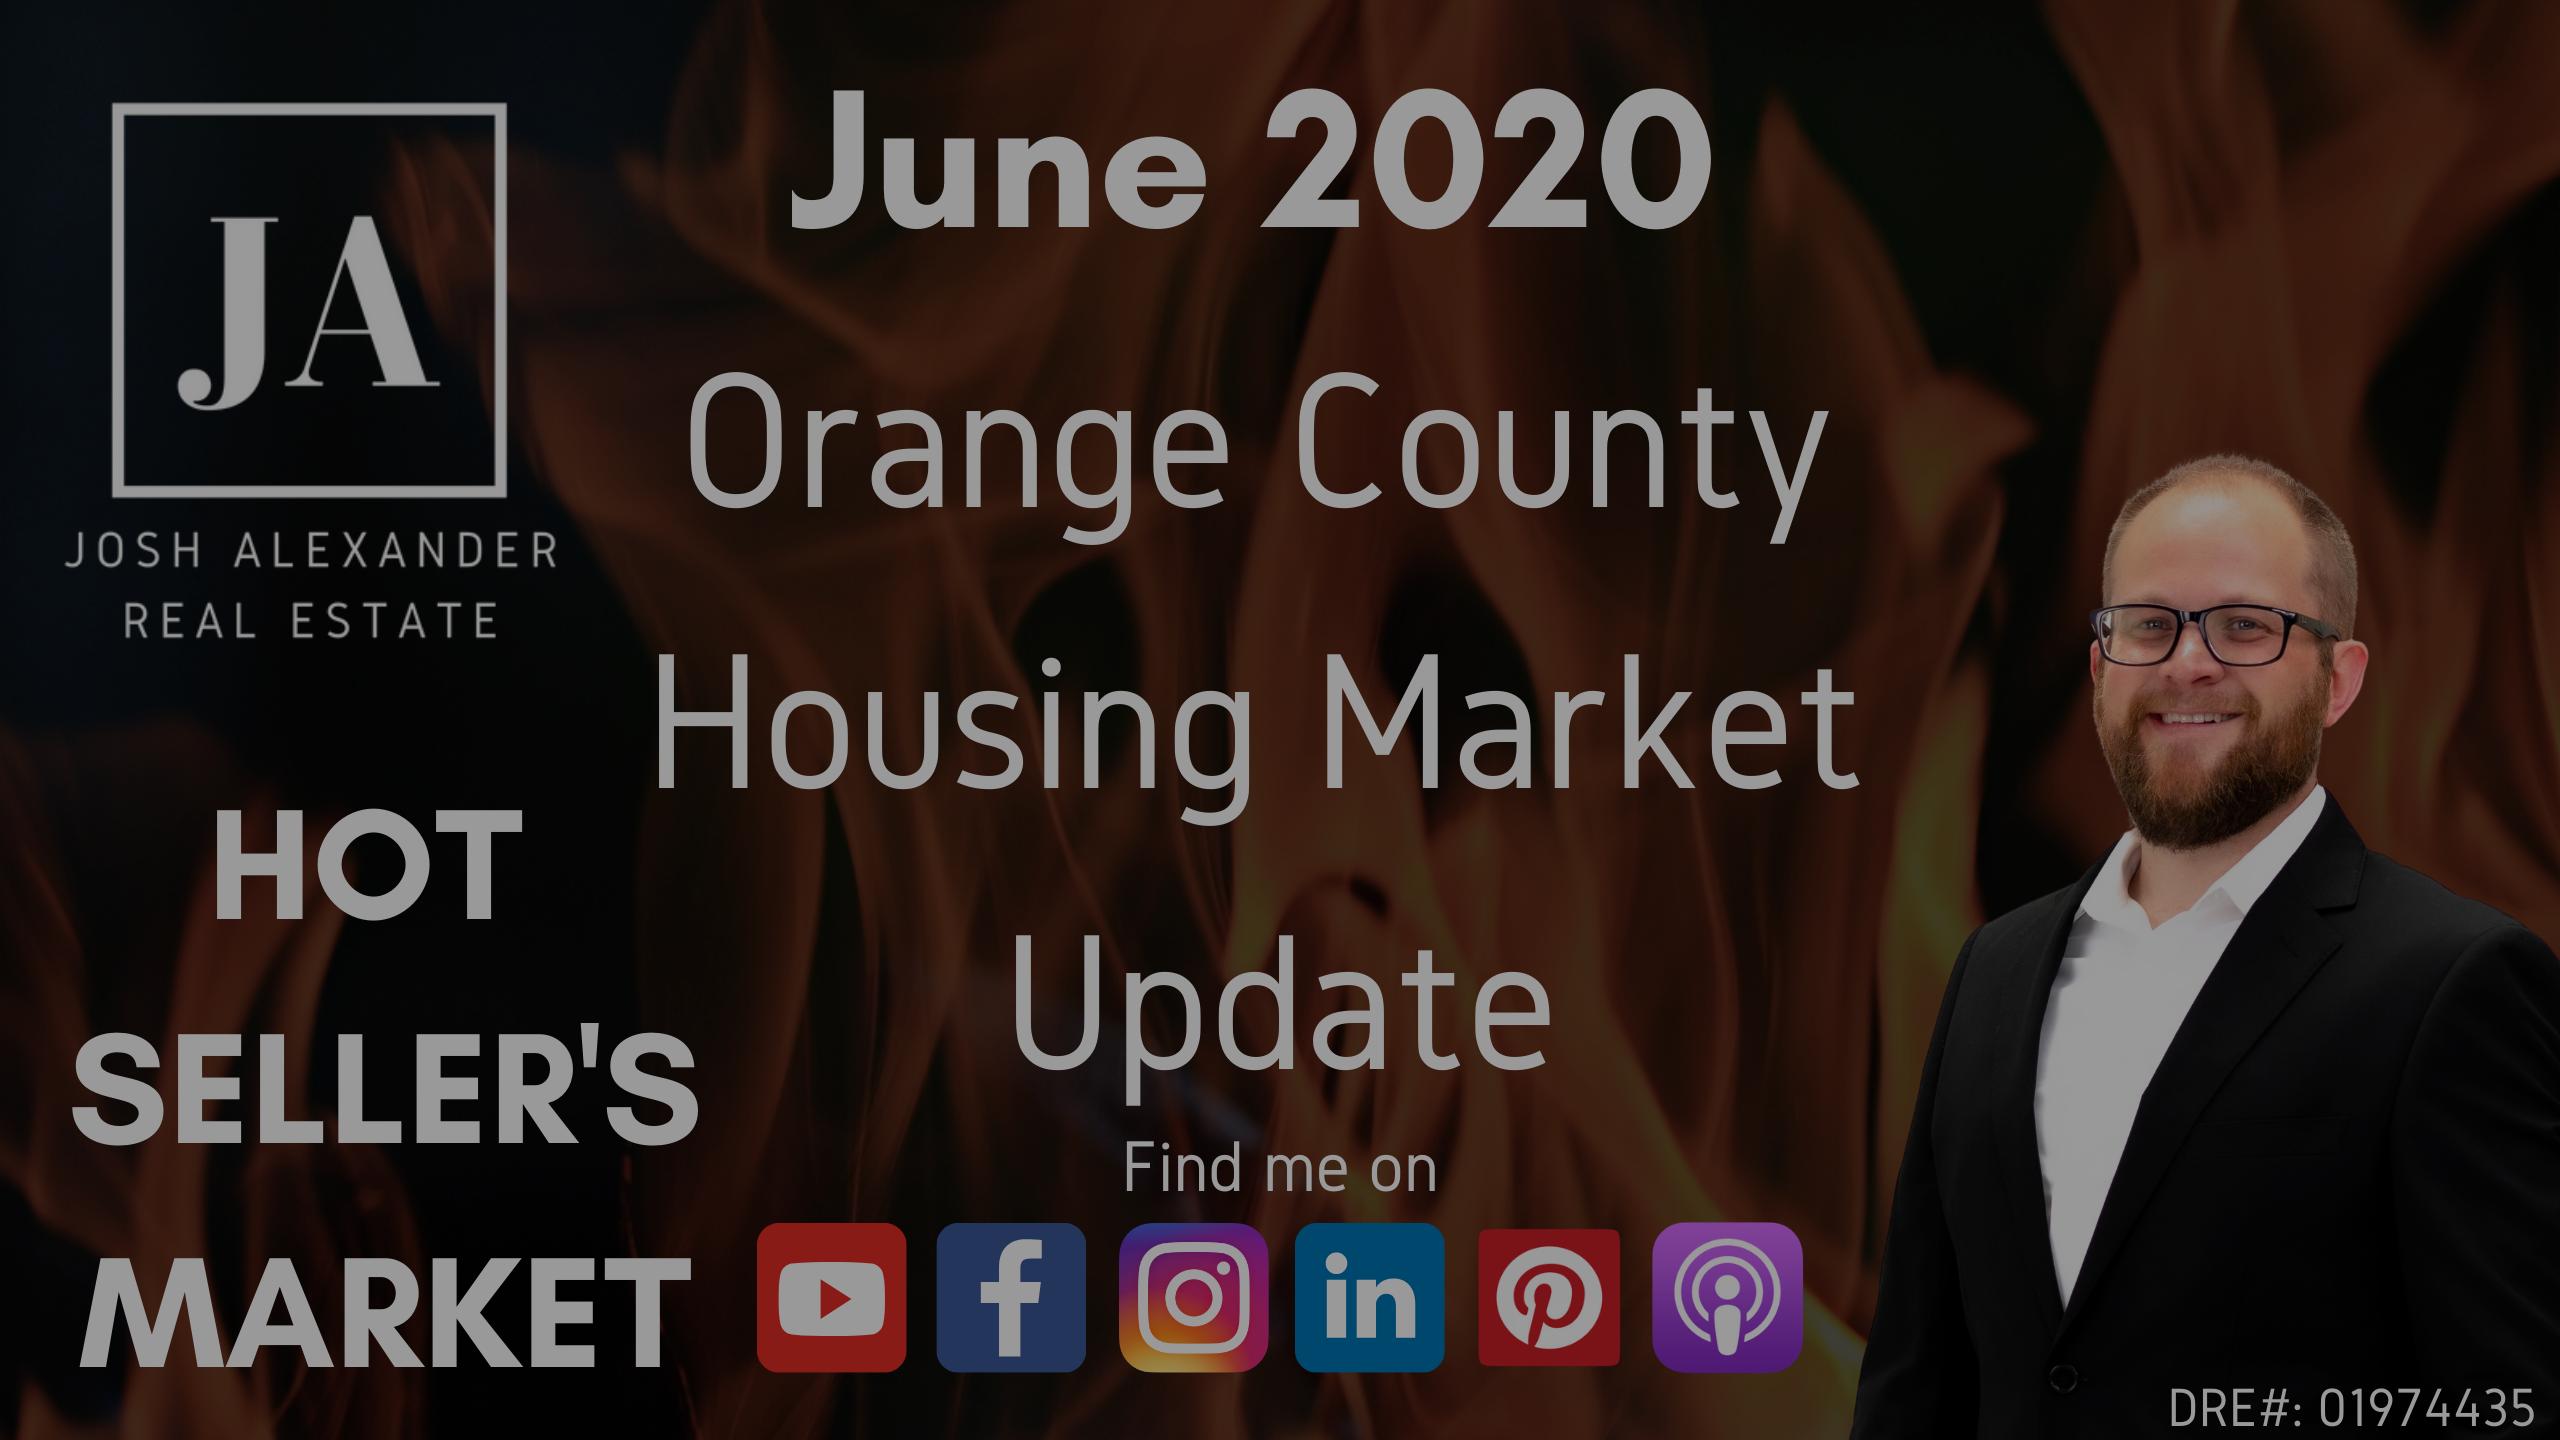 June 2020 Orange County Housing Market Update